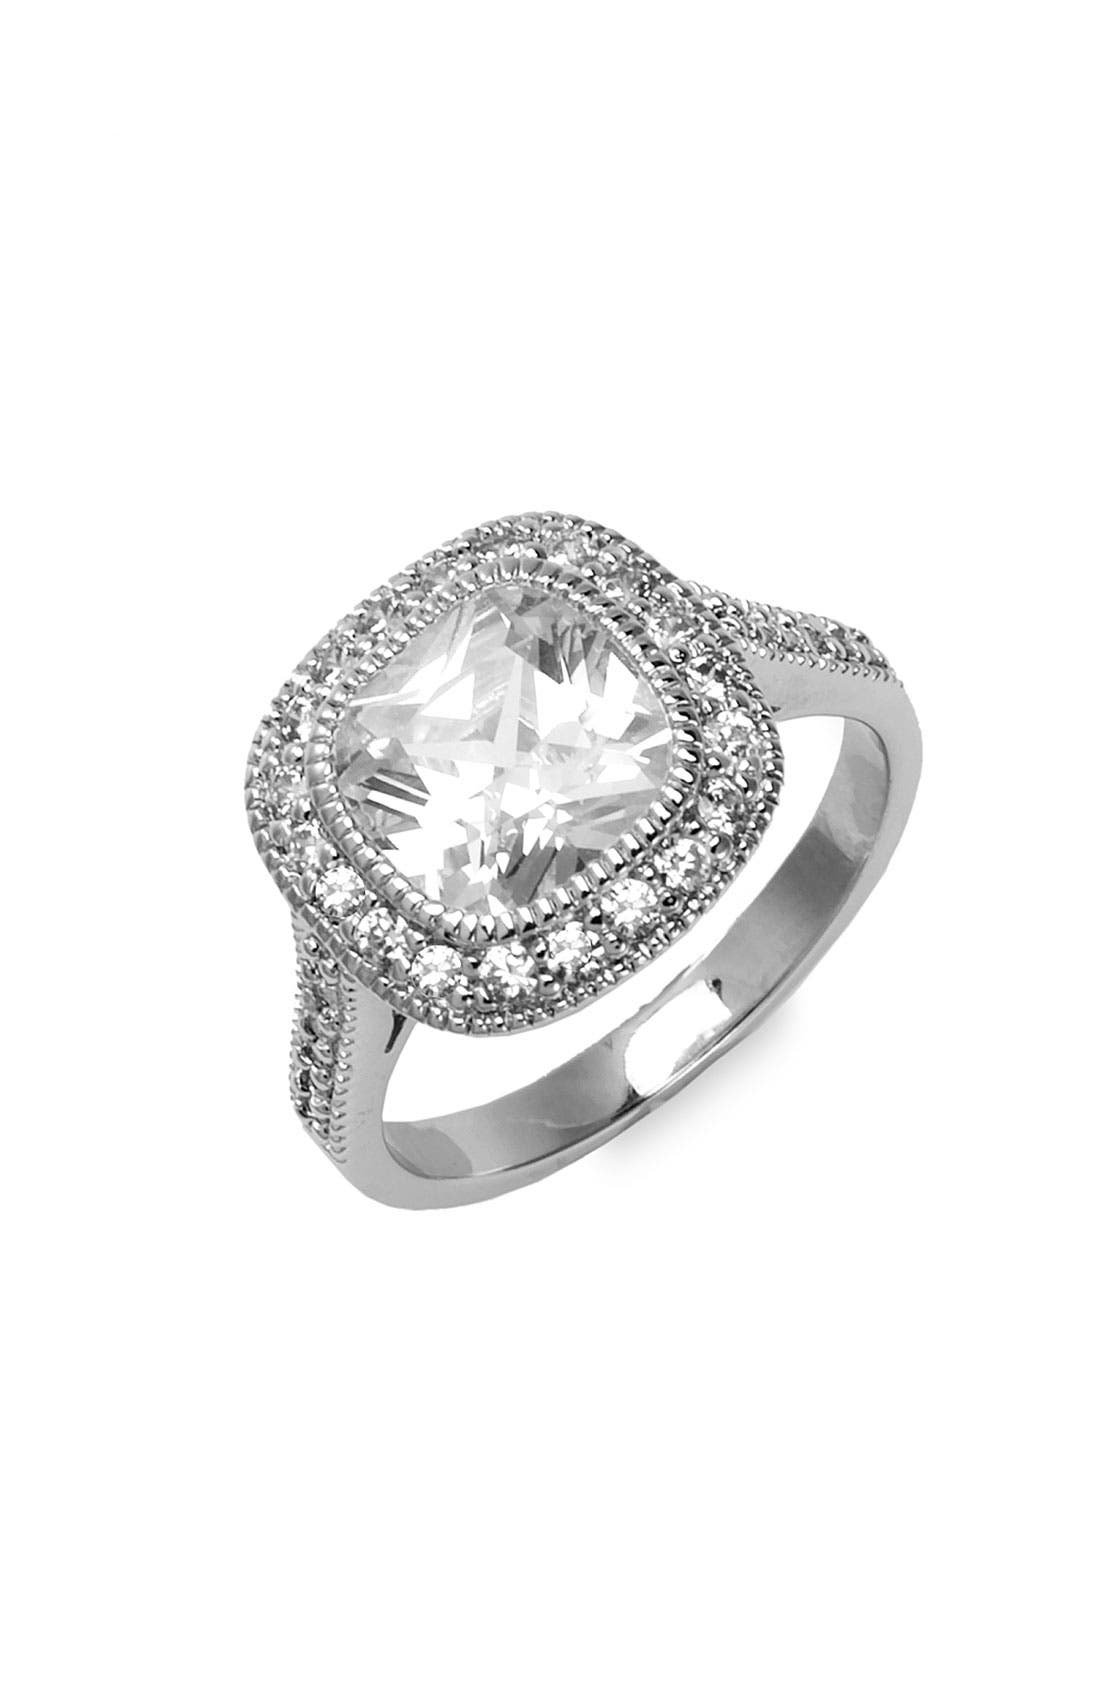 Main Image - Ariella Collection Cushion Cut Ring